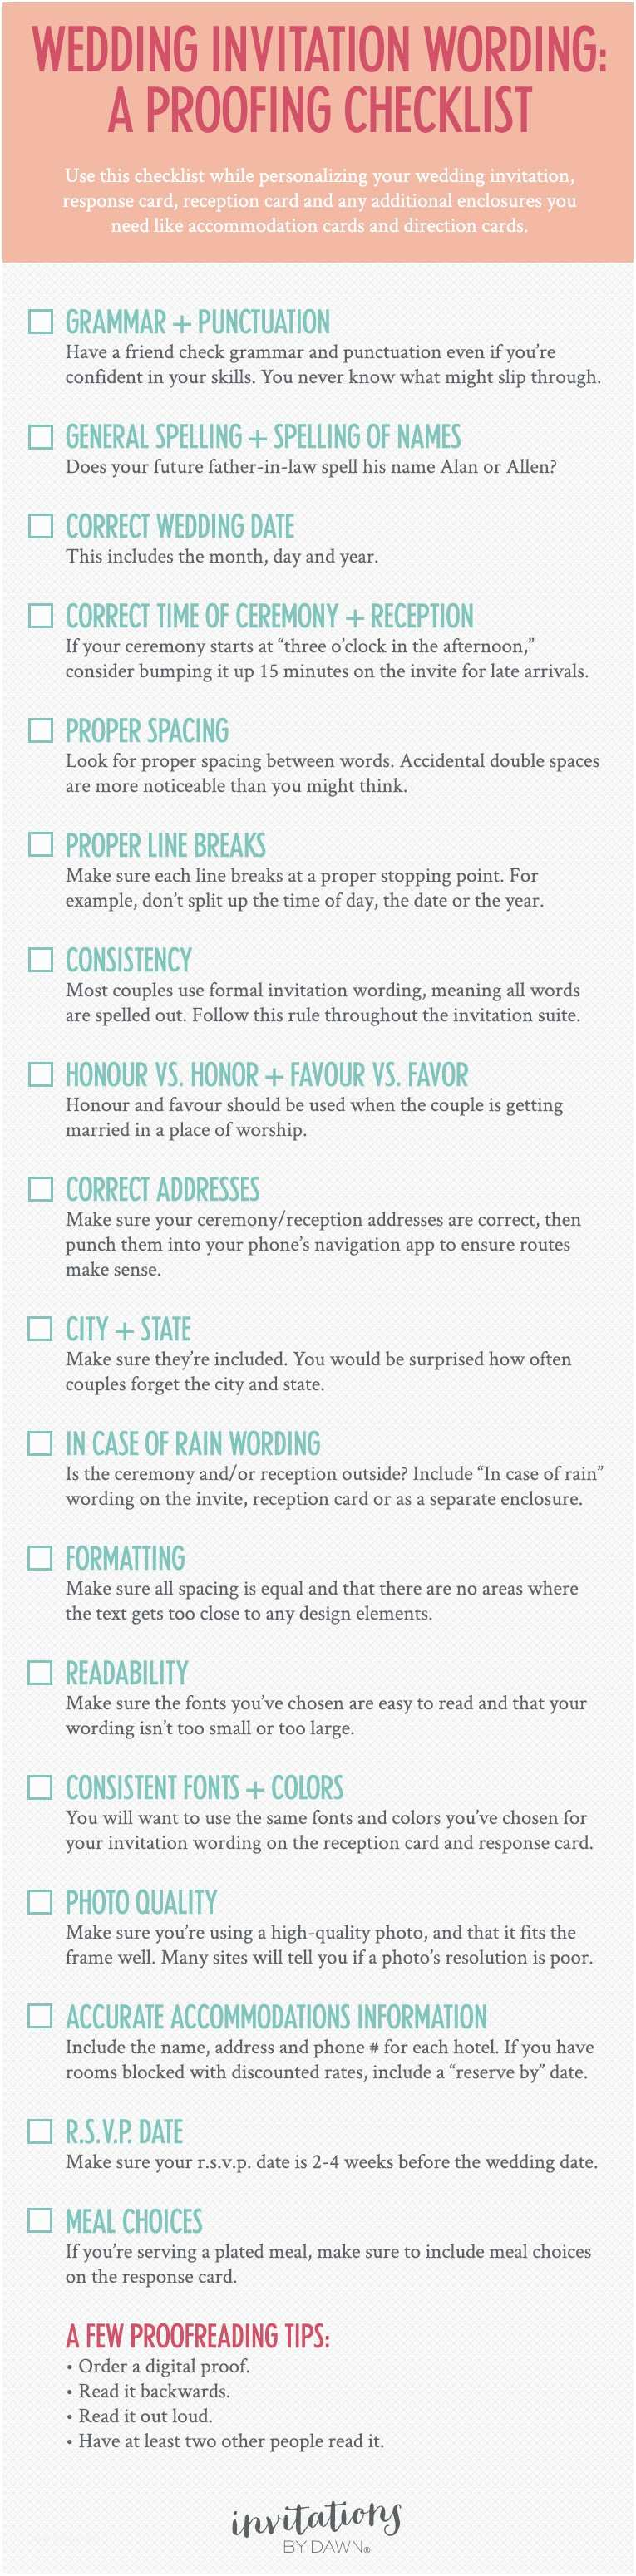 Wedding Invitation Checklist A Proofing Checklist for Wedding Invitations